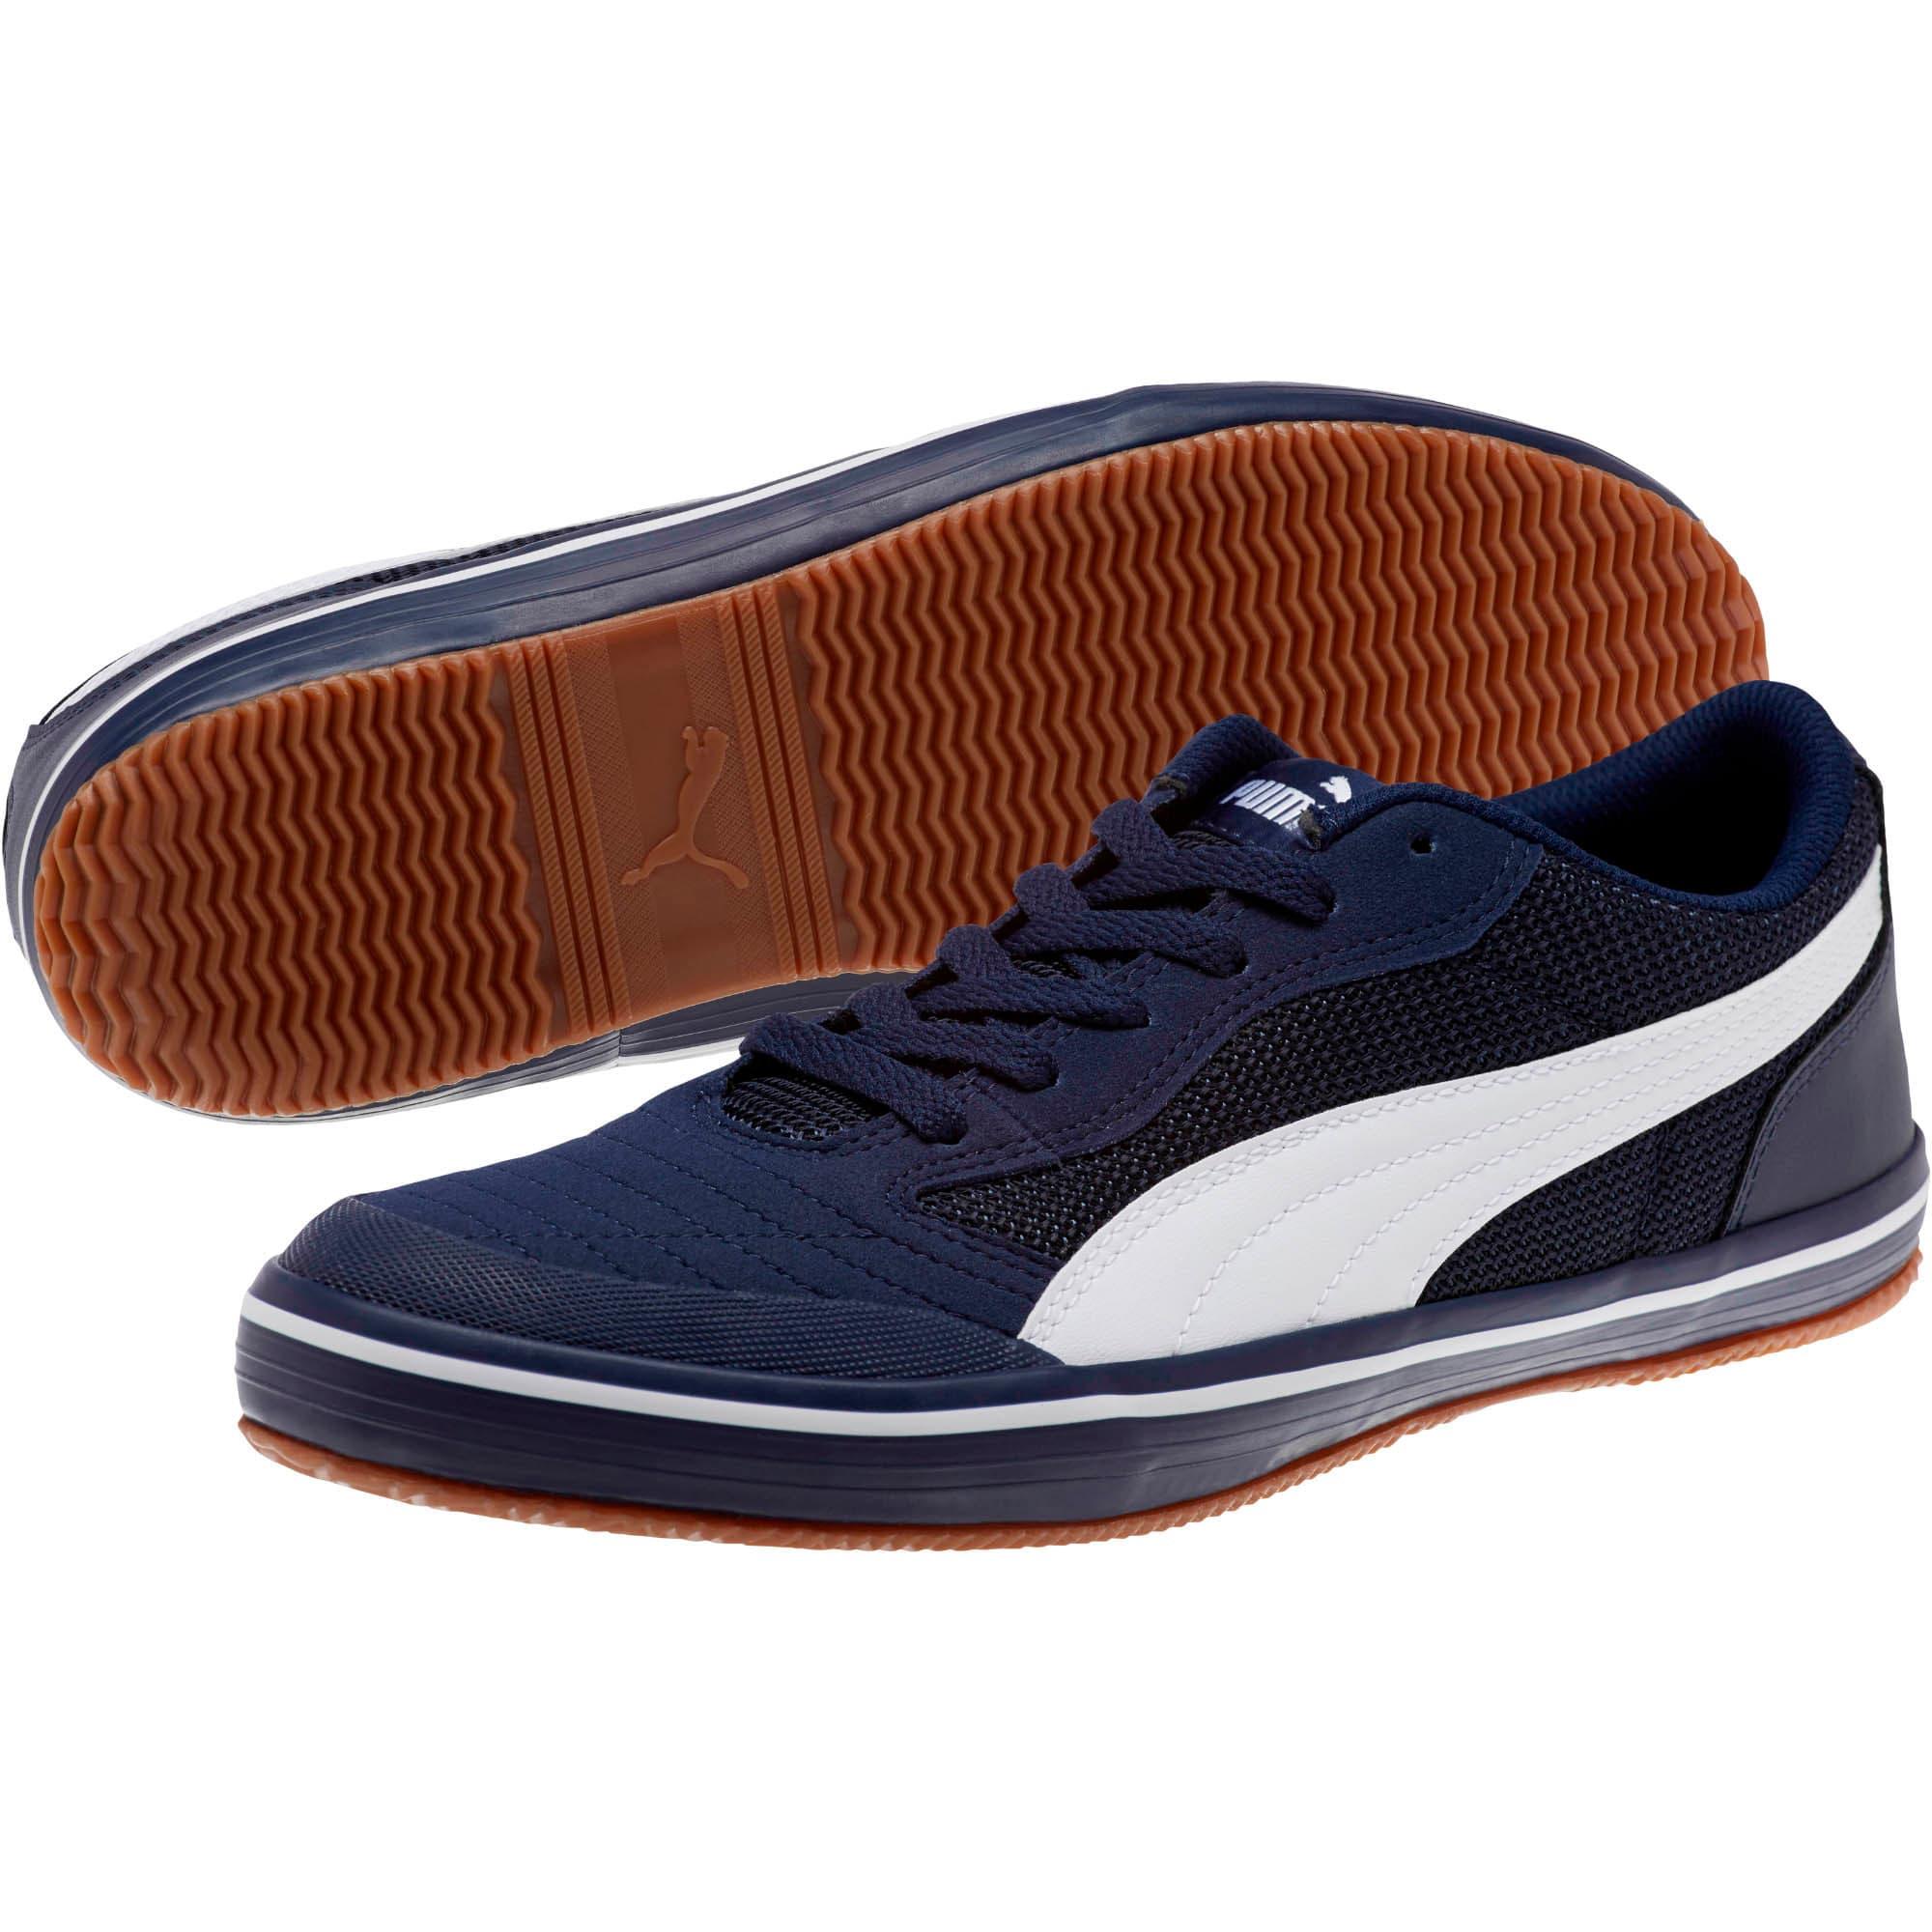 Miniatura 2 de Zapatos deportivos Astro Sala para hombre, Peacoat-Puma White, mediano